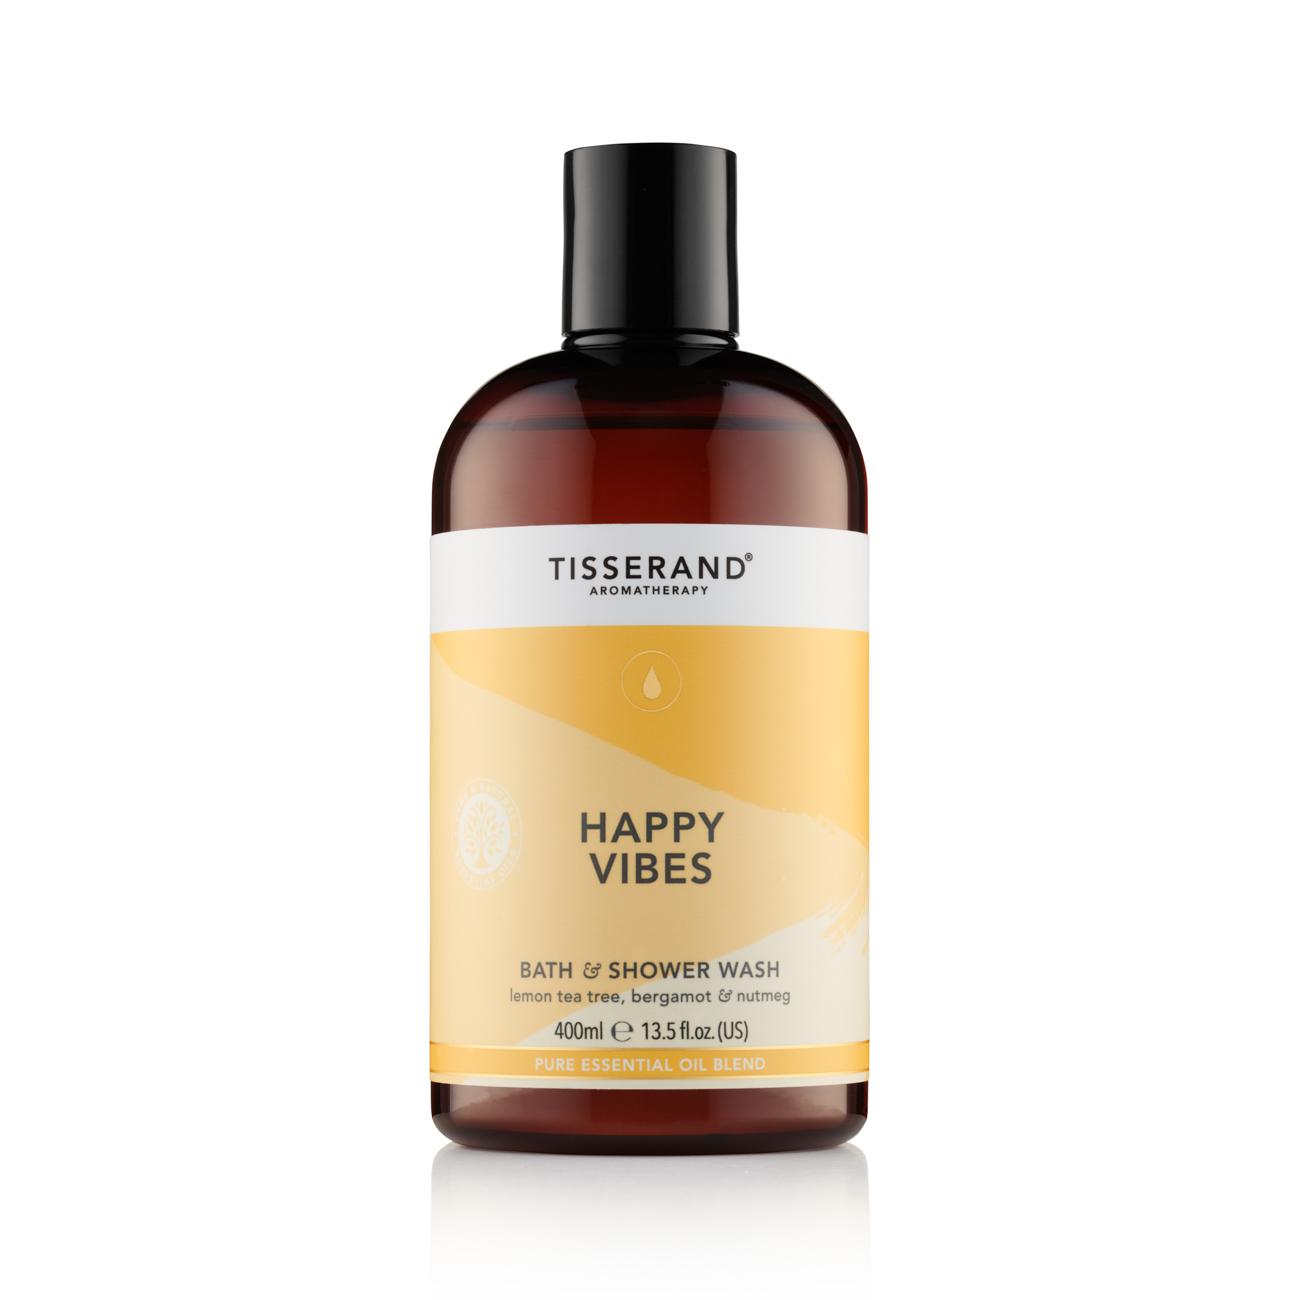 Happy Vibes Bath & Shower Wash 400ml